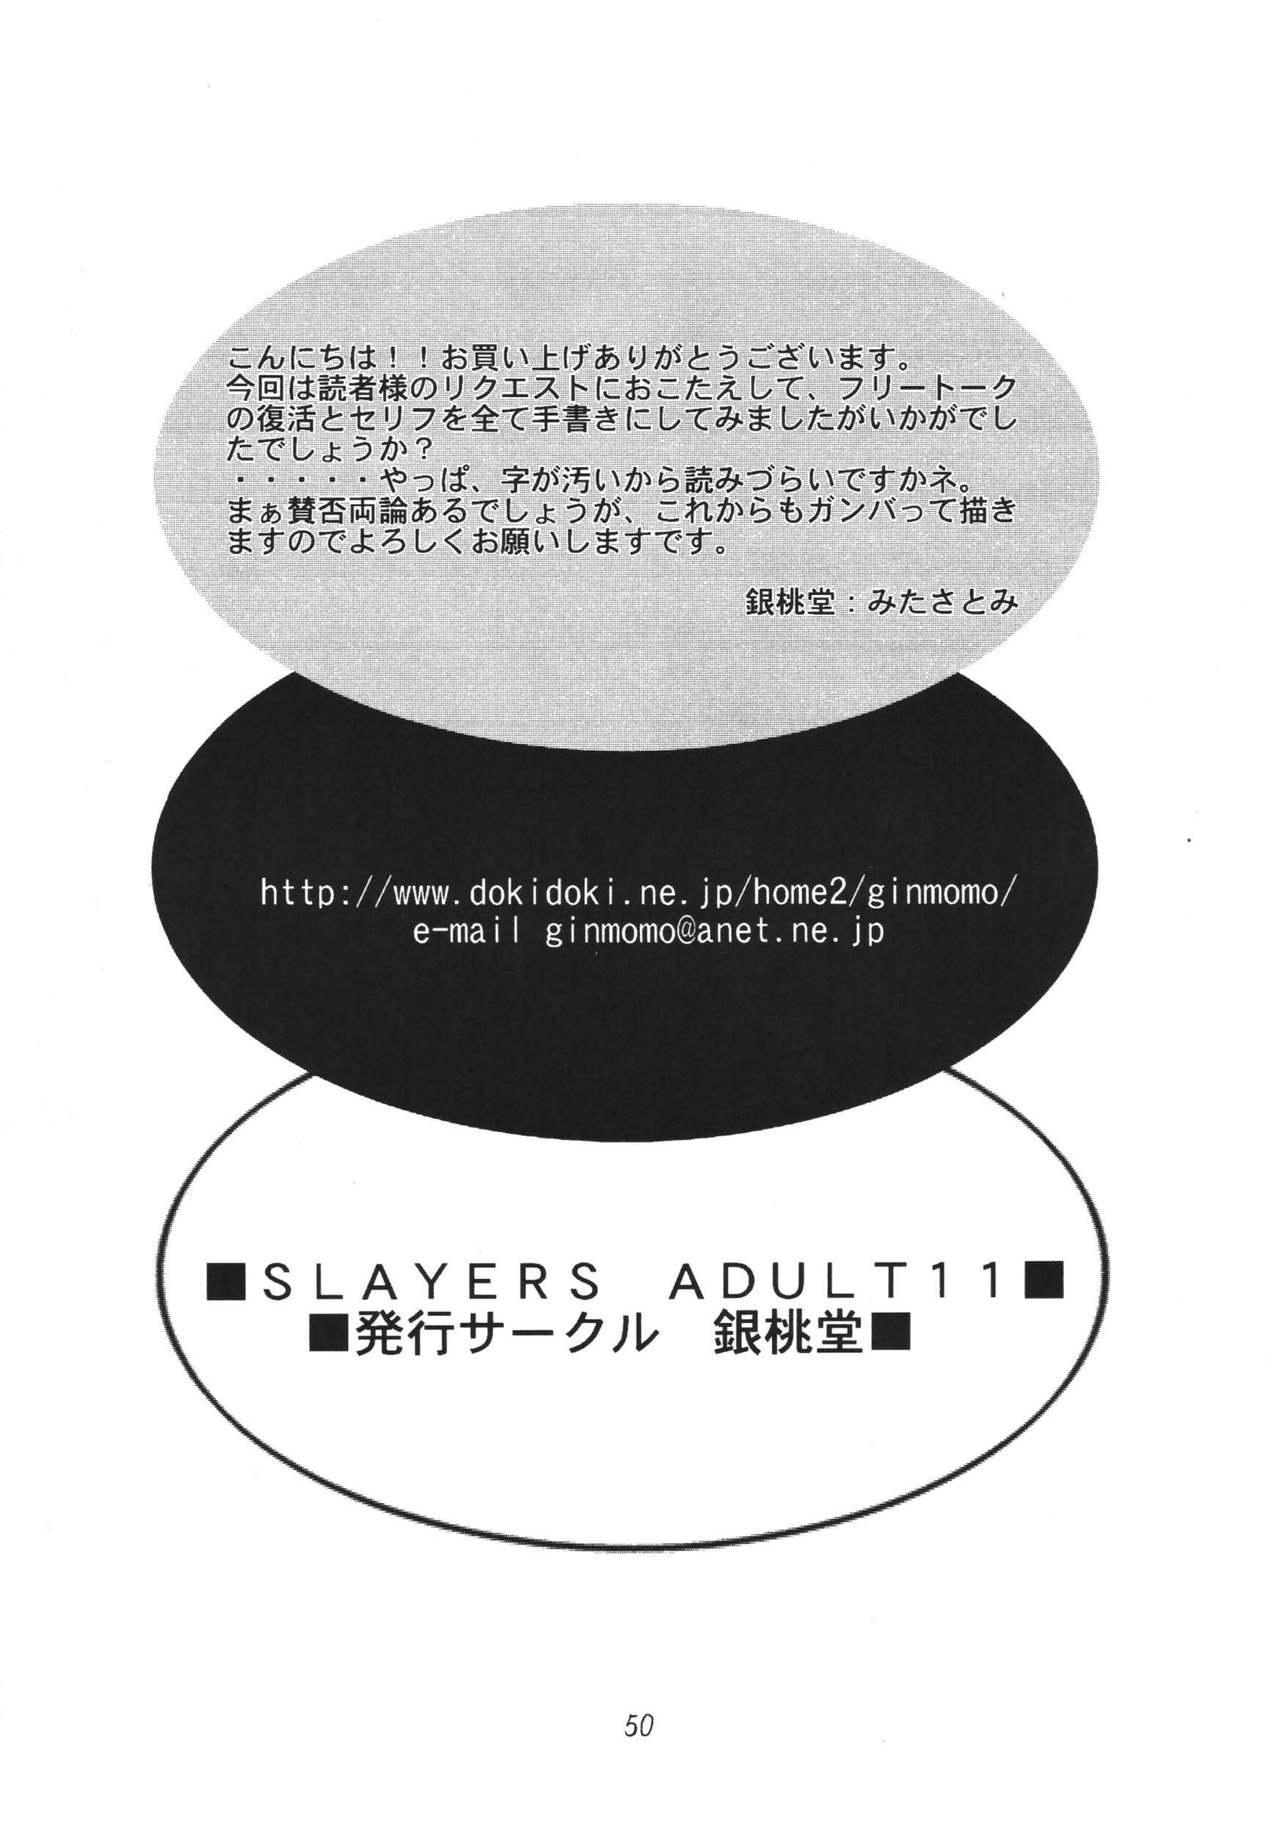 SLAYERS ADULT 11 49